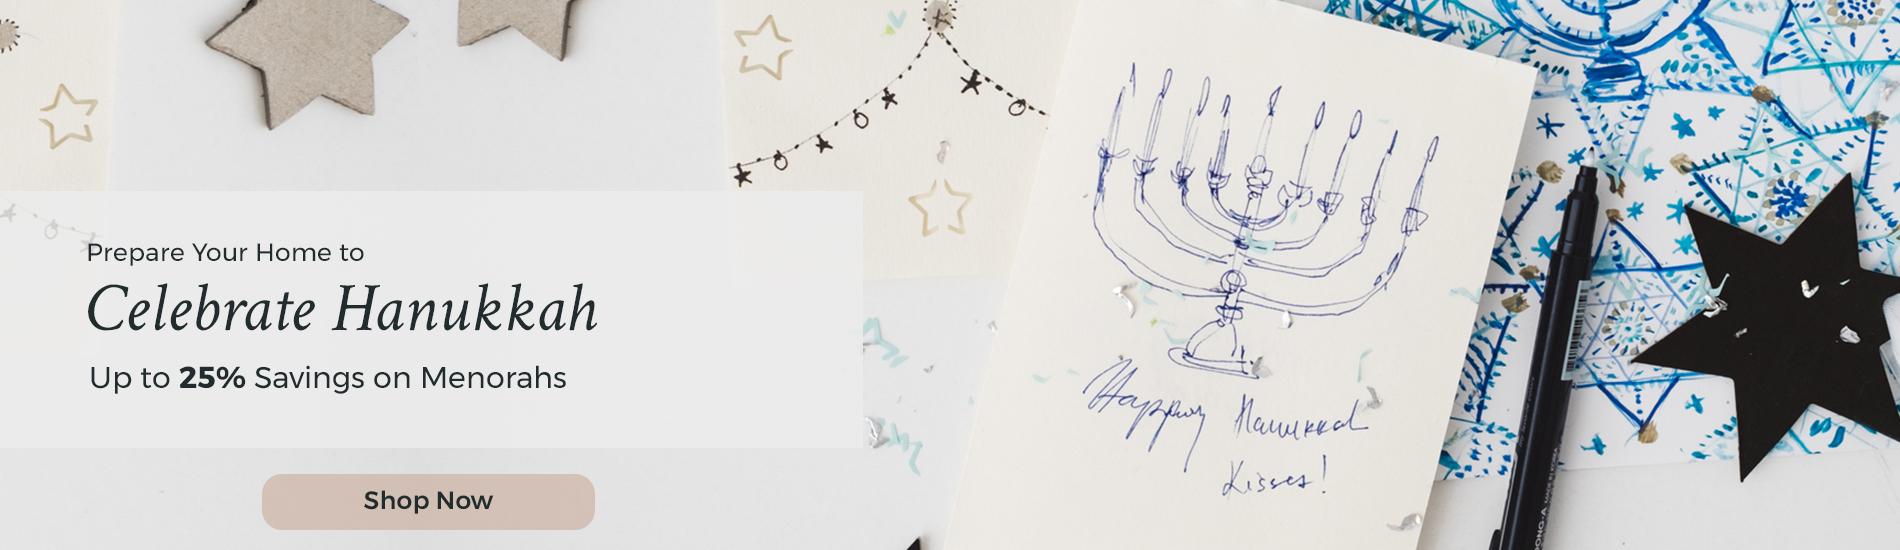 Shop Hanukkah Menorahs for up to 25% Off at Judaica.com!